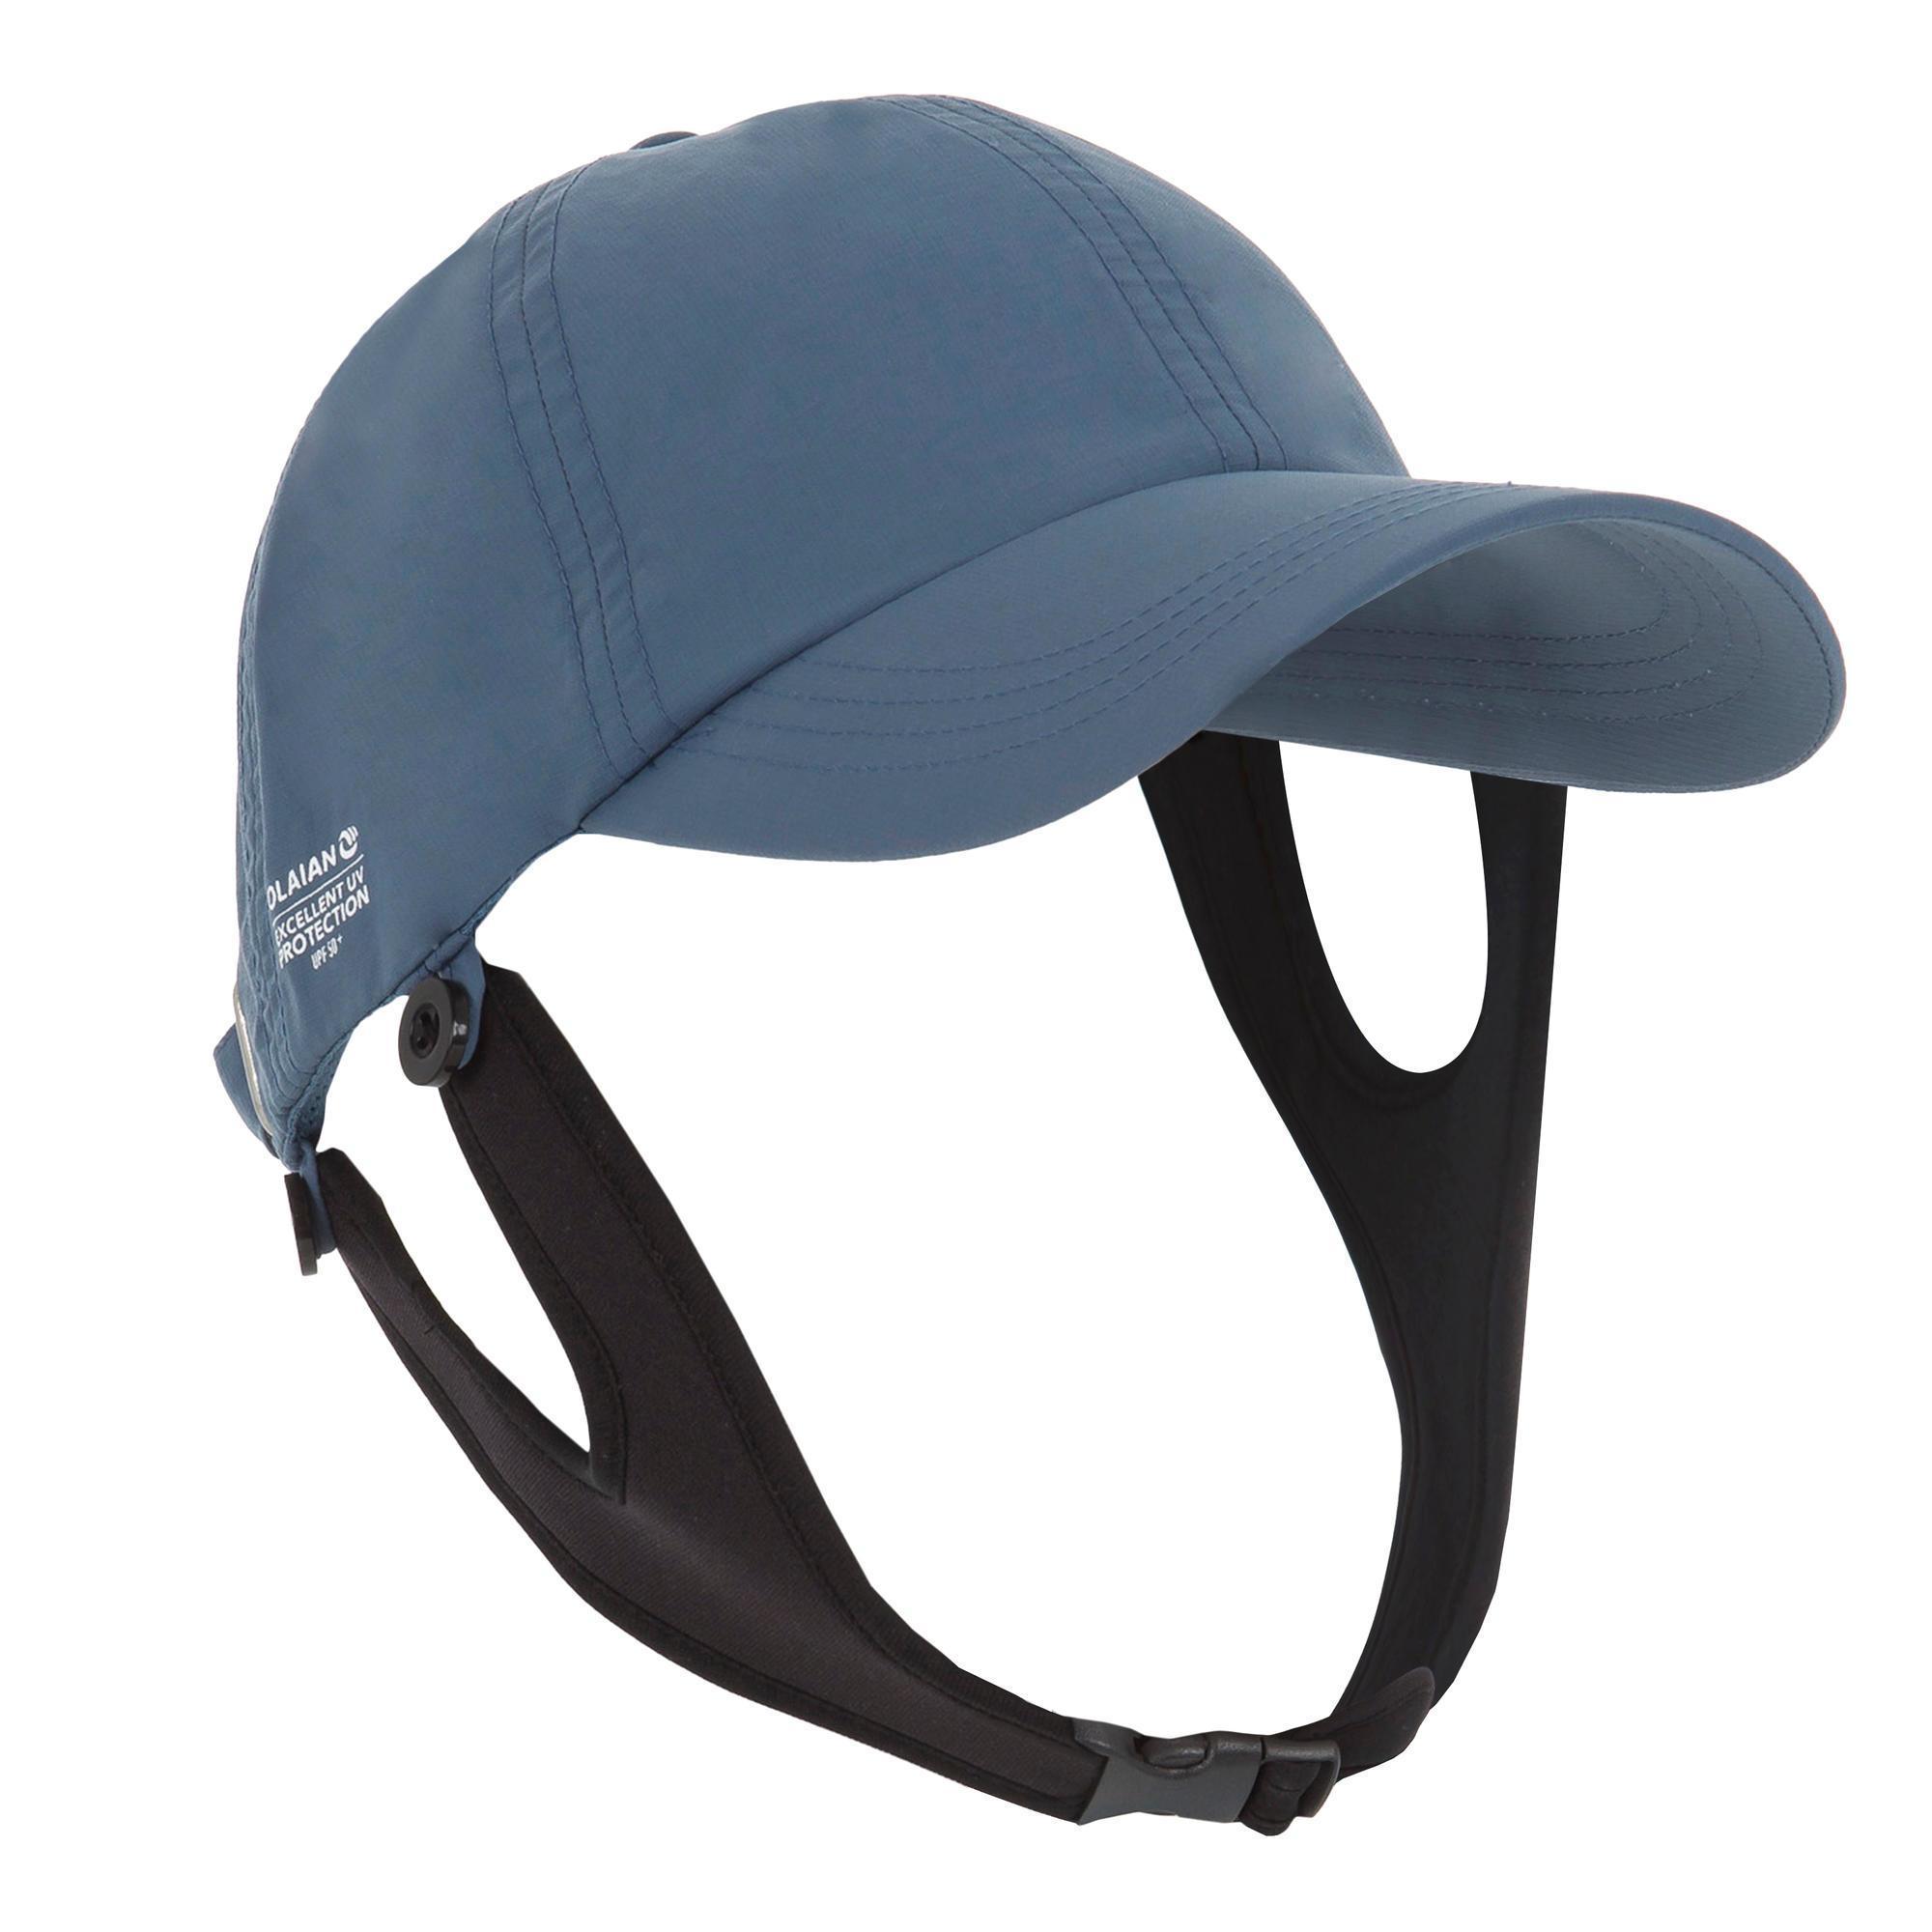 UV-Cap Surfen Erwachsene grau | Accessoires > Caps > Sonstige Caps | Grau - Blau | Olaian